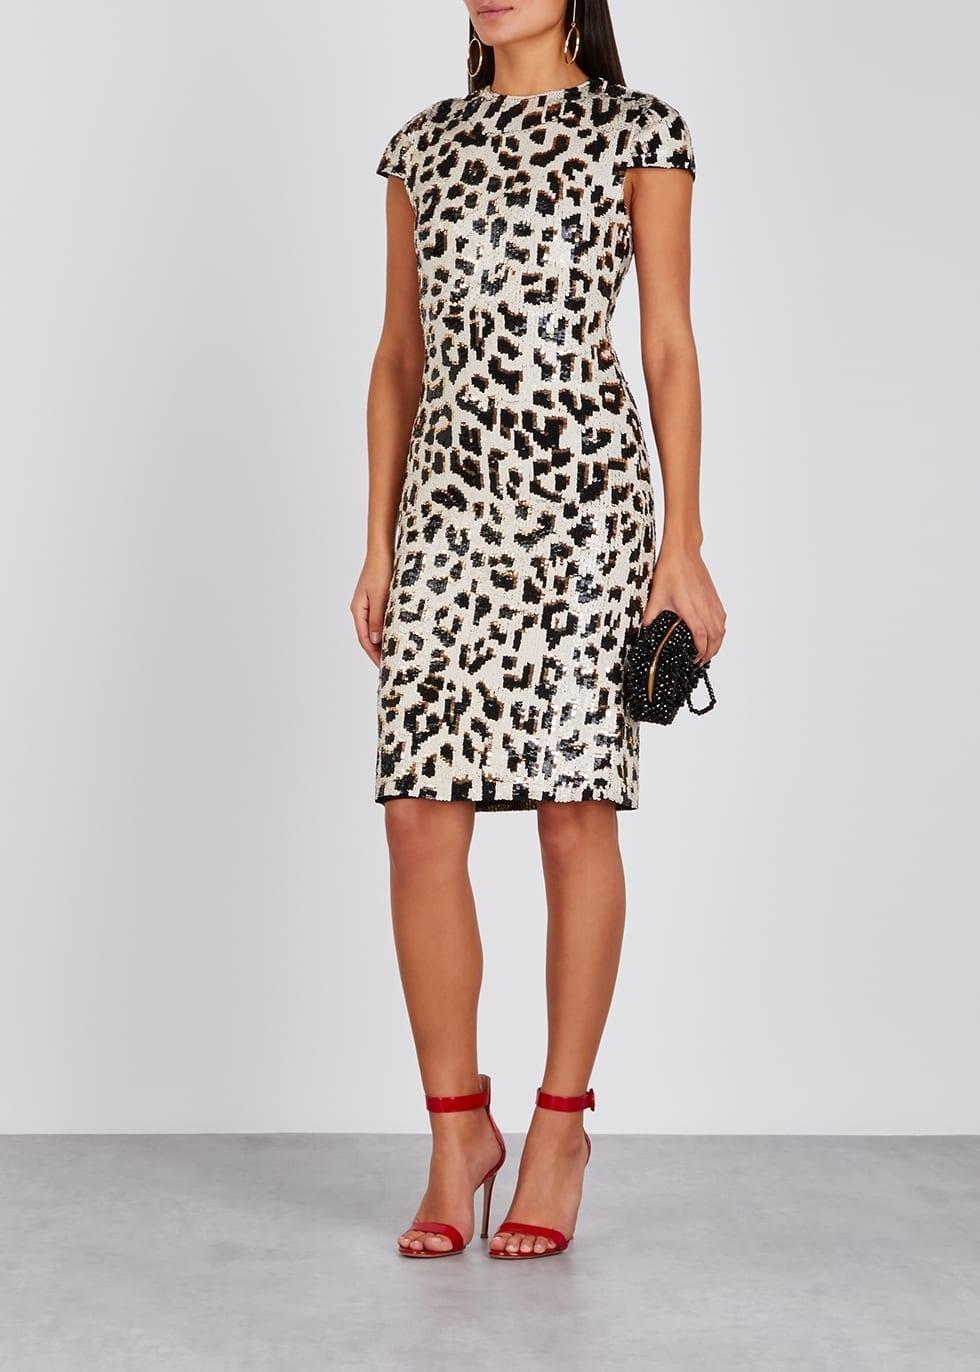 714d6b82d6fa ALICE + OLIVIA Nat leopard sequin Beige dress - We Select Dresses